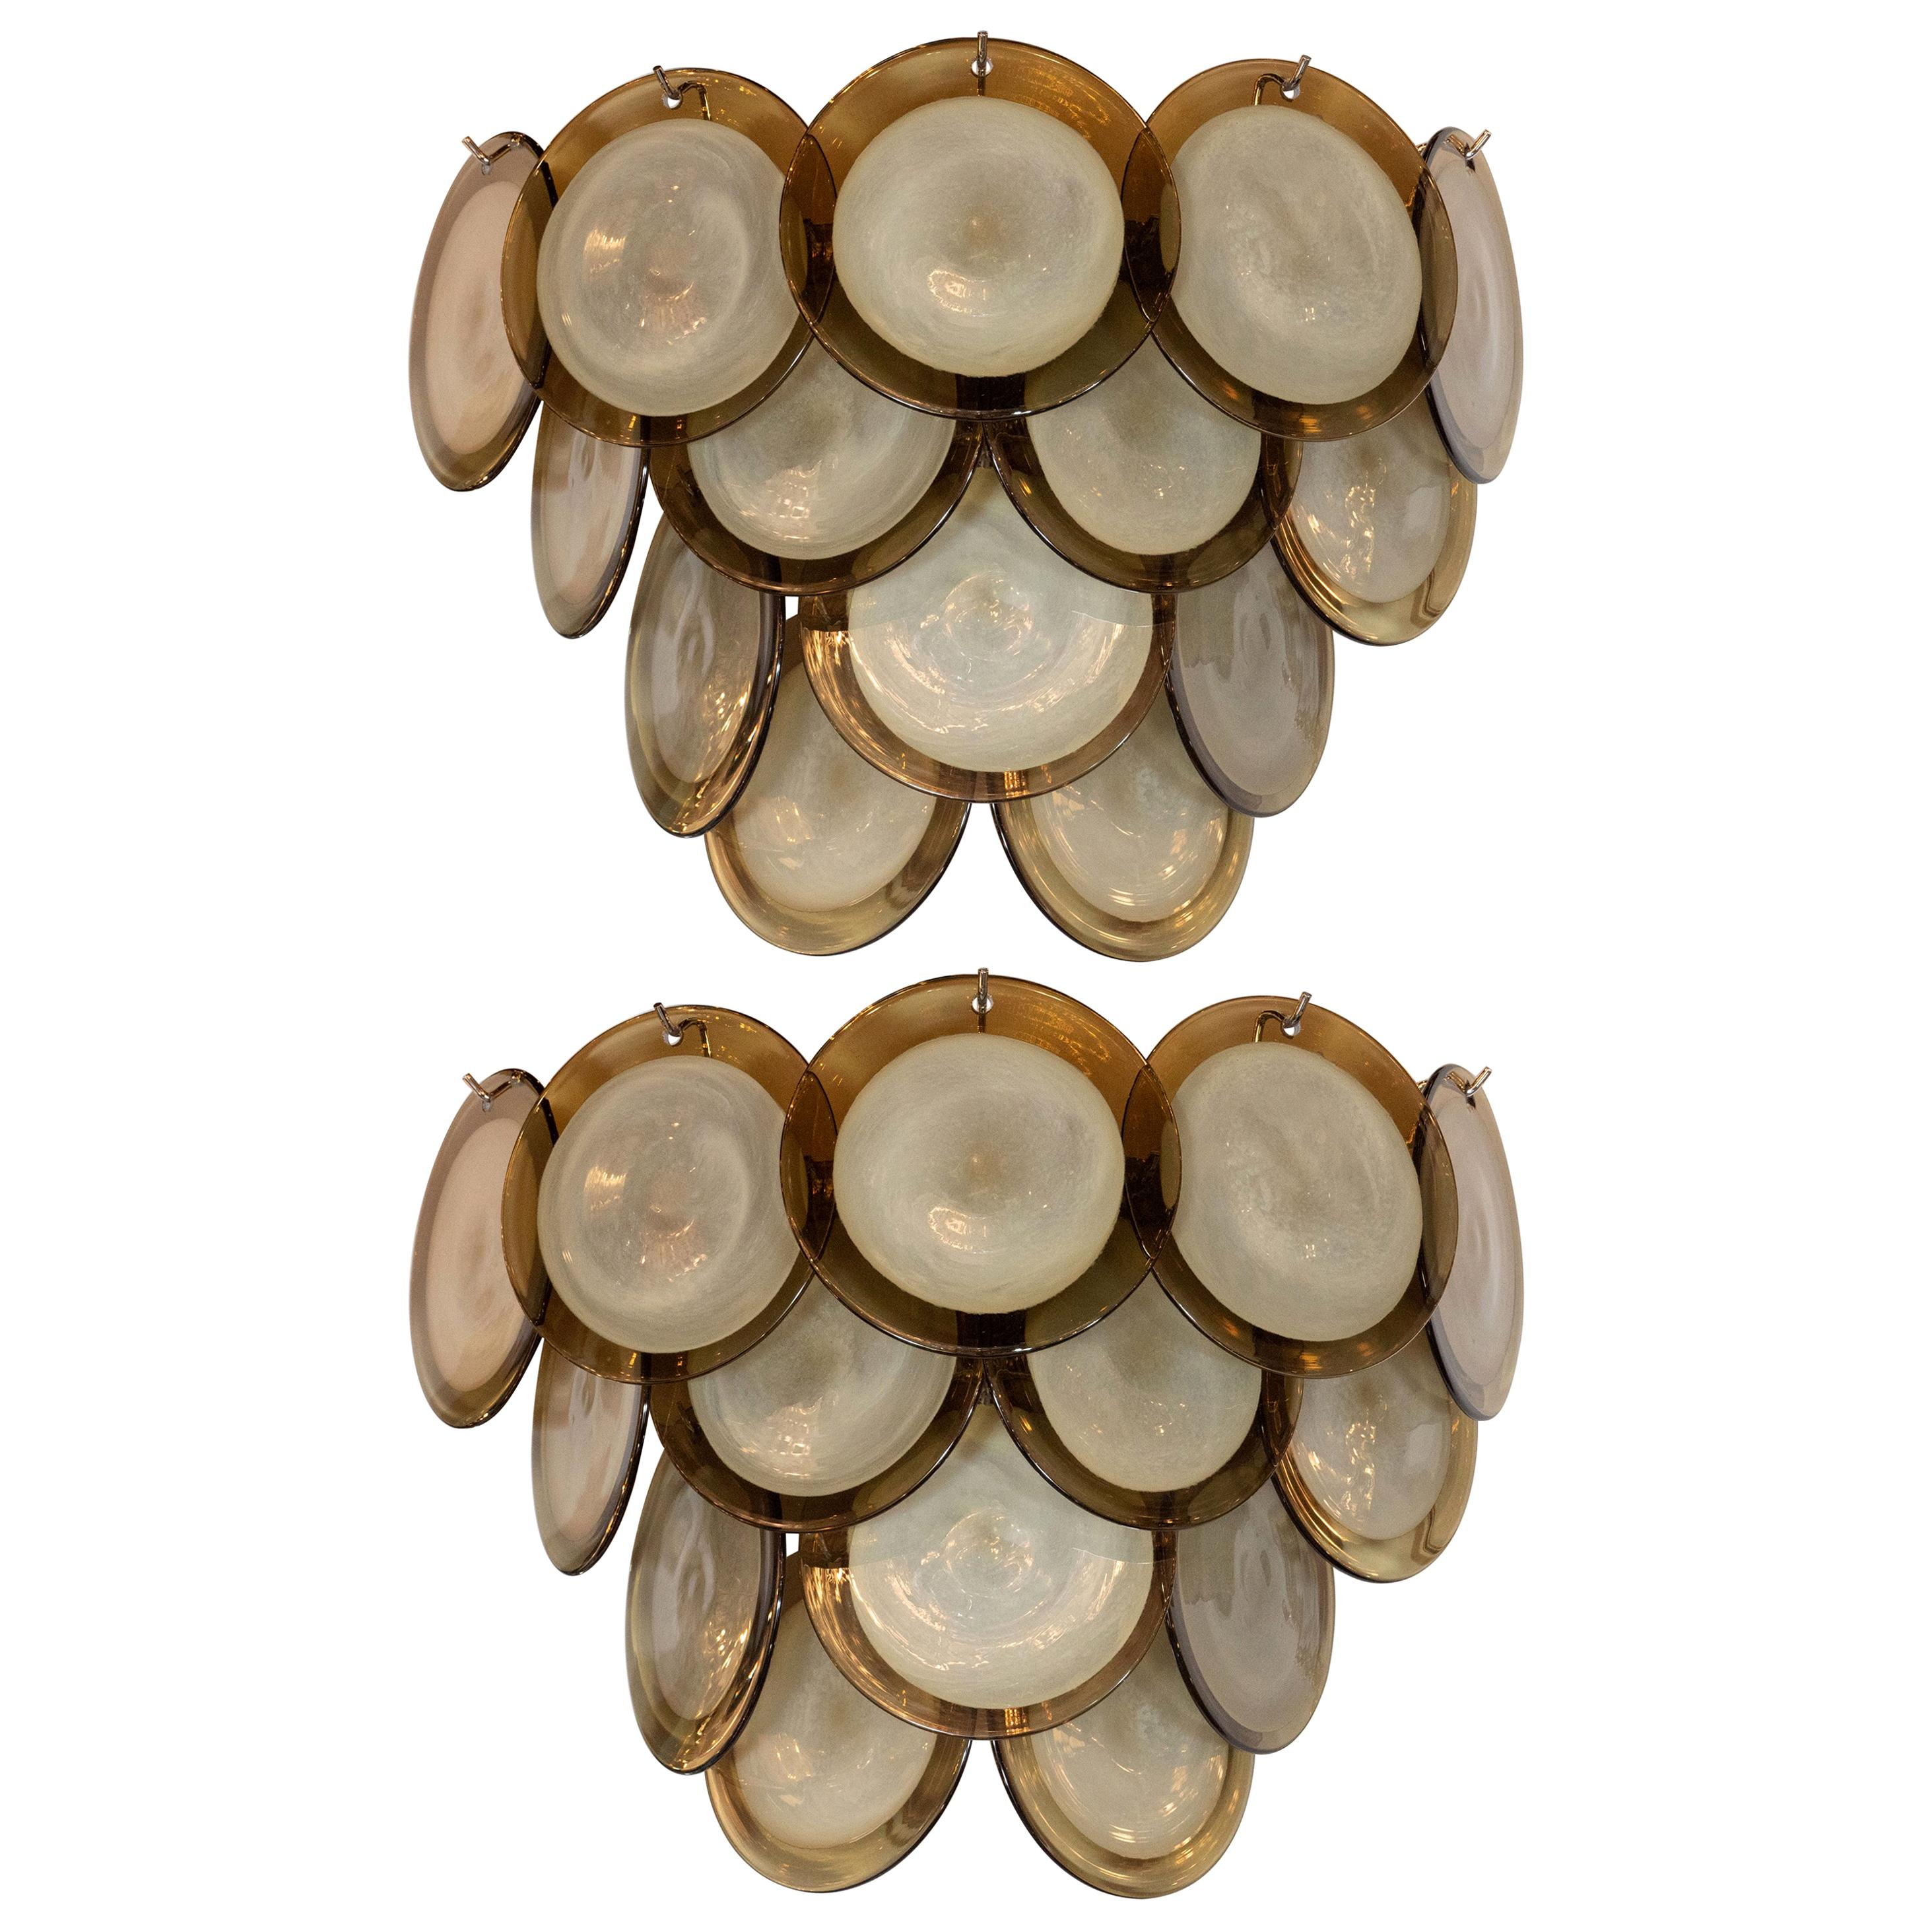 Pair of Modernist 14-Disc Sconces in Handblown Murano Topaz & Translucent Glass